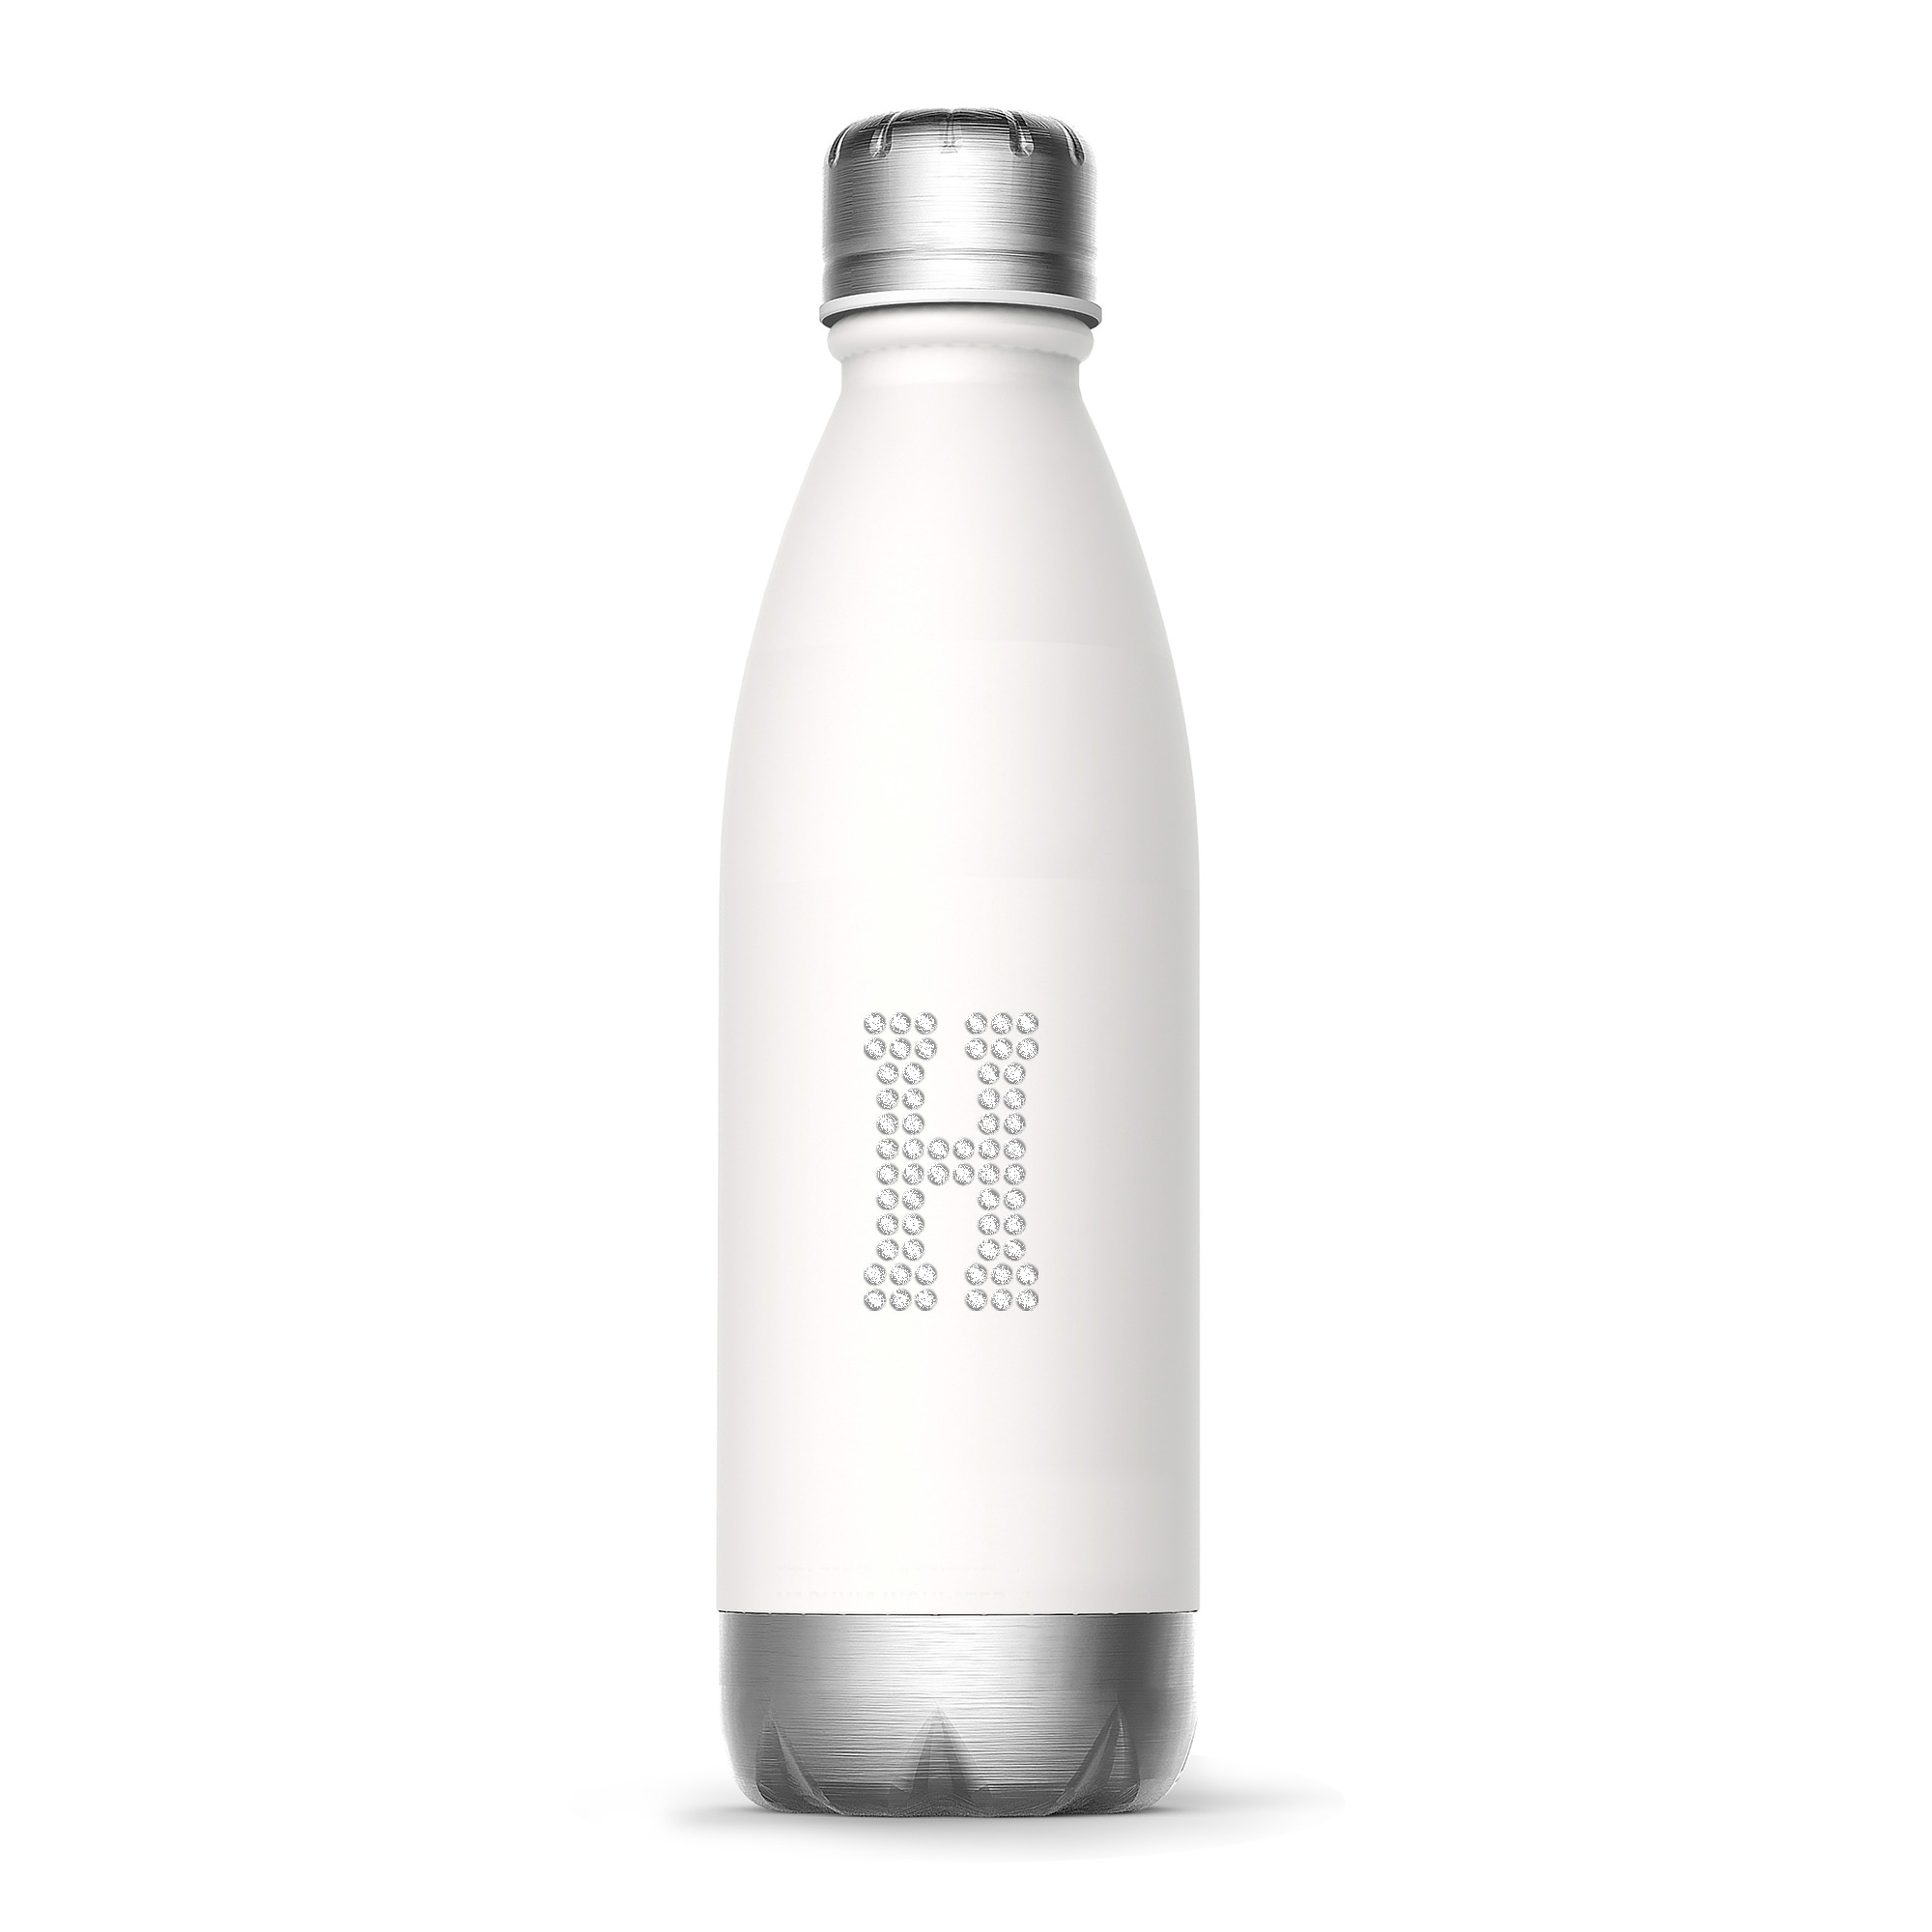 White Vacuum Sealed Fitness Water  Bottle (Optional Personalized Crystal Rhinestones)